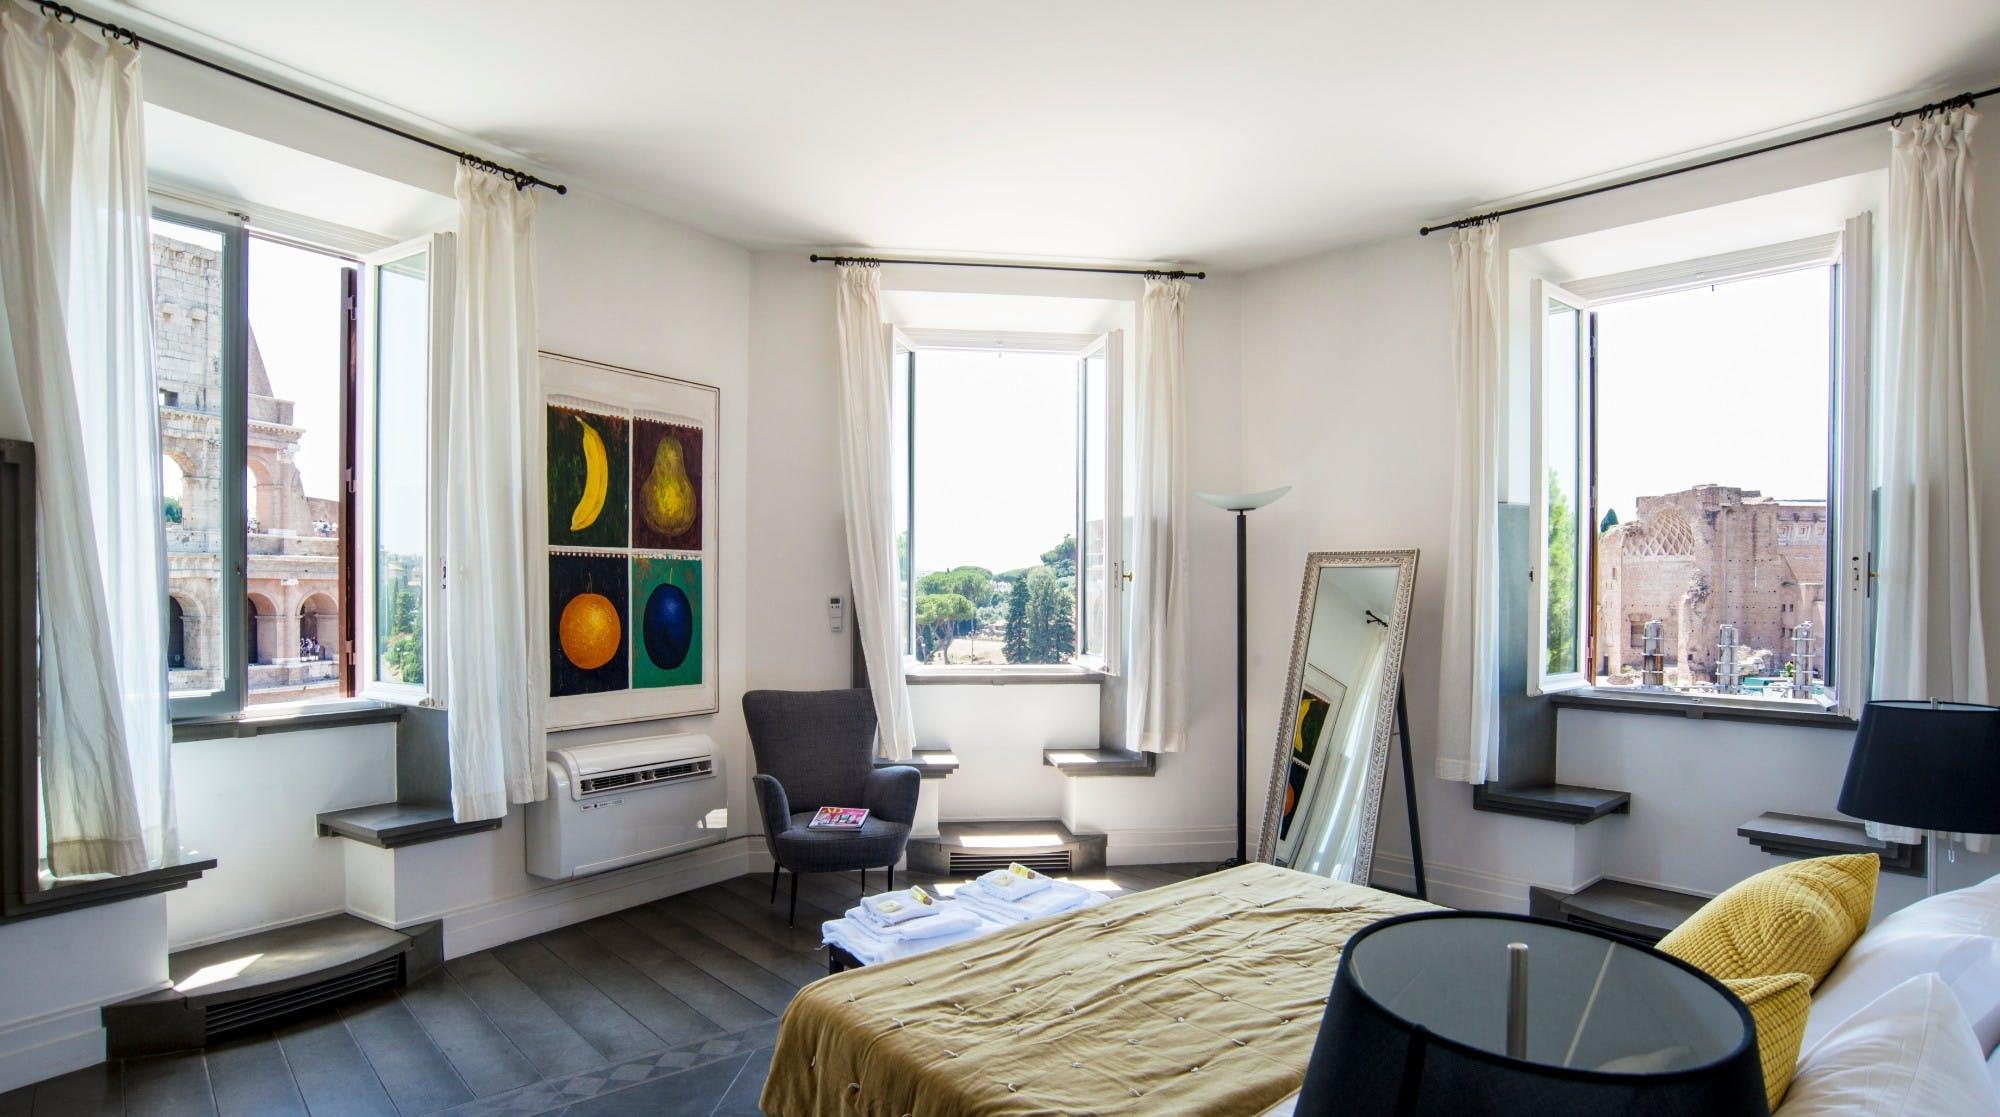 bedroom celio furniture cosy. Bedroom Celio Furniture Cosy